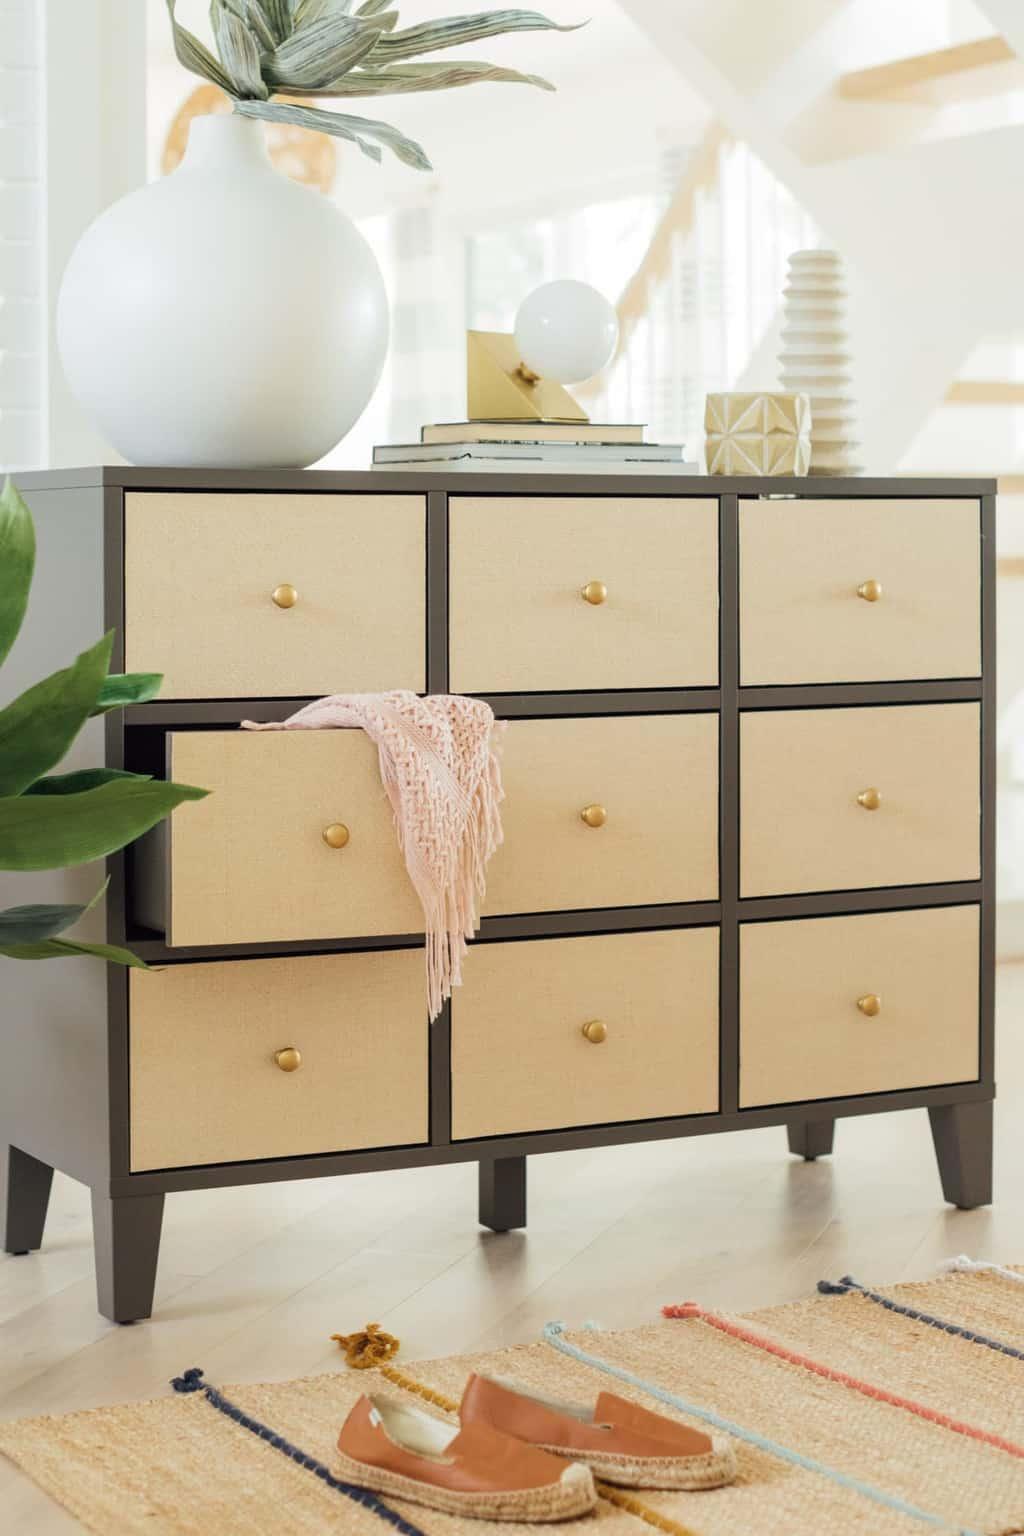 Diy Ikea Drawers How To Make Easy Rattan Drawers Sugar Cloth